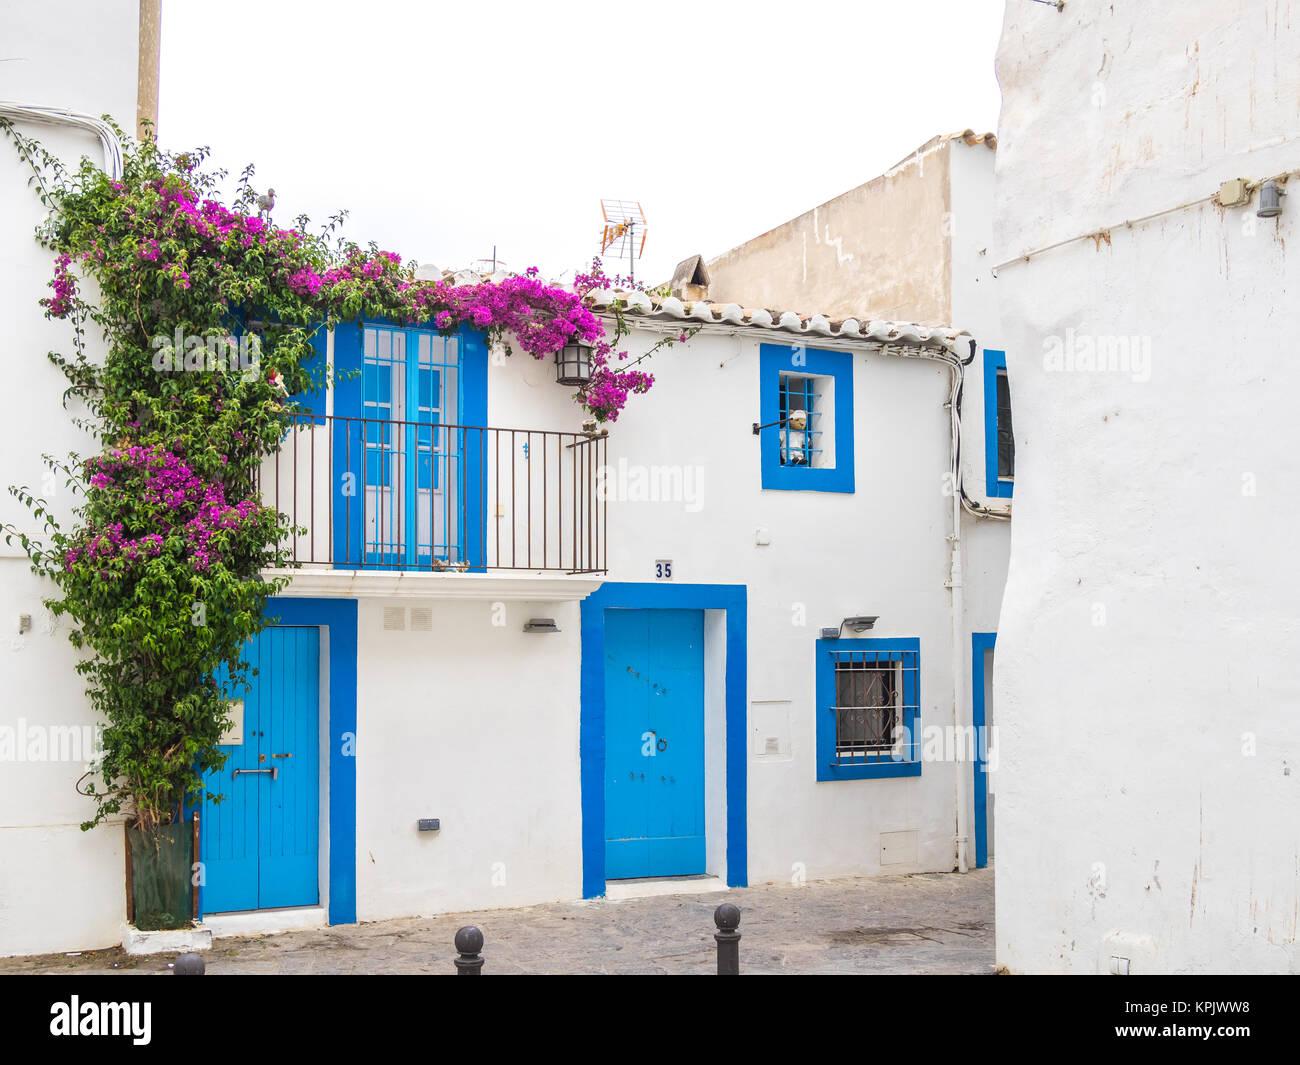 IBIZA, SPAIN - MAY 23, 2015. The distinctive Ibiza architecture reflects a mediterranean style. Stock Photo